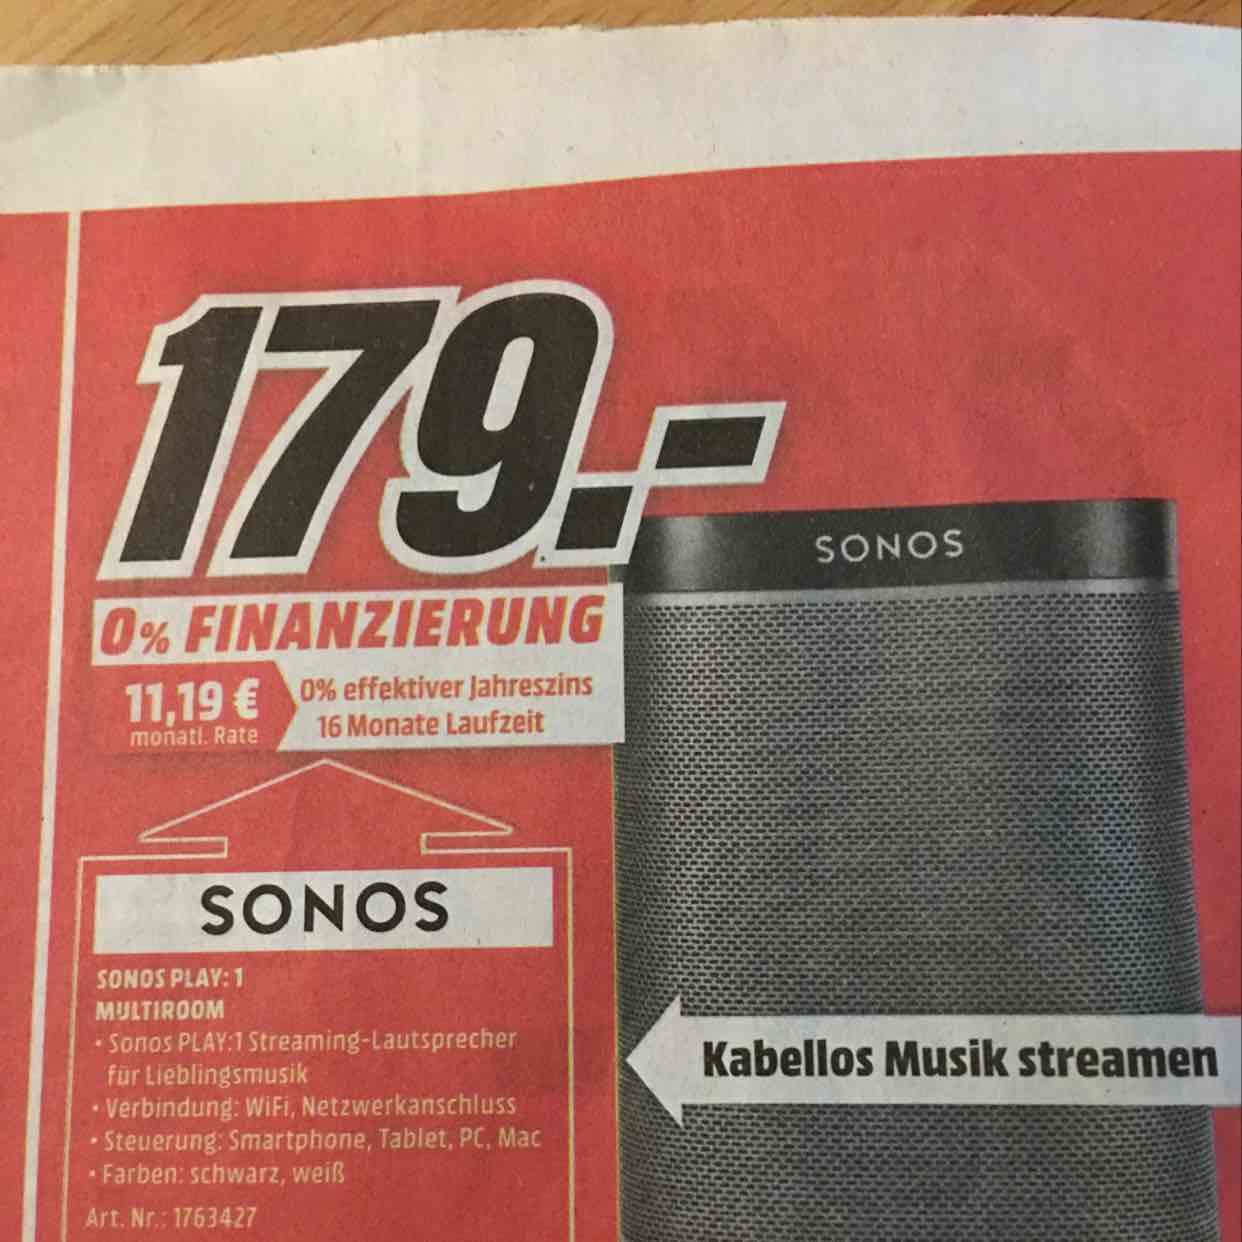 MM Nürnberg & Schwabach: Sonos Play: 1